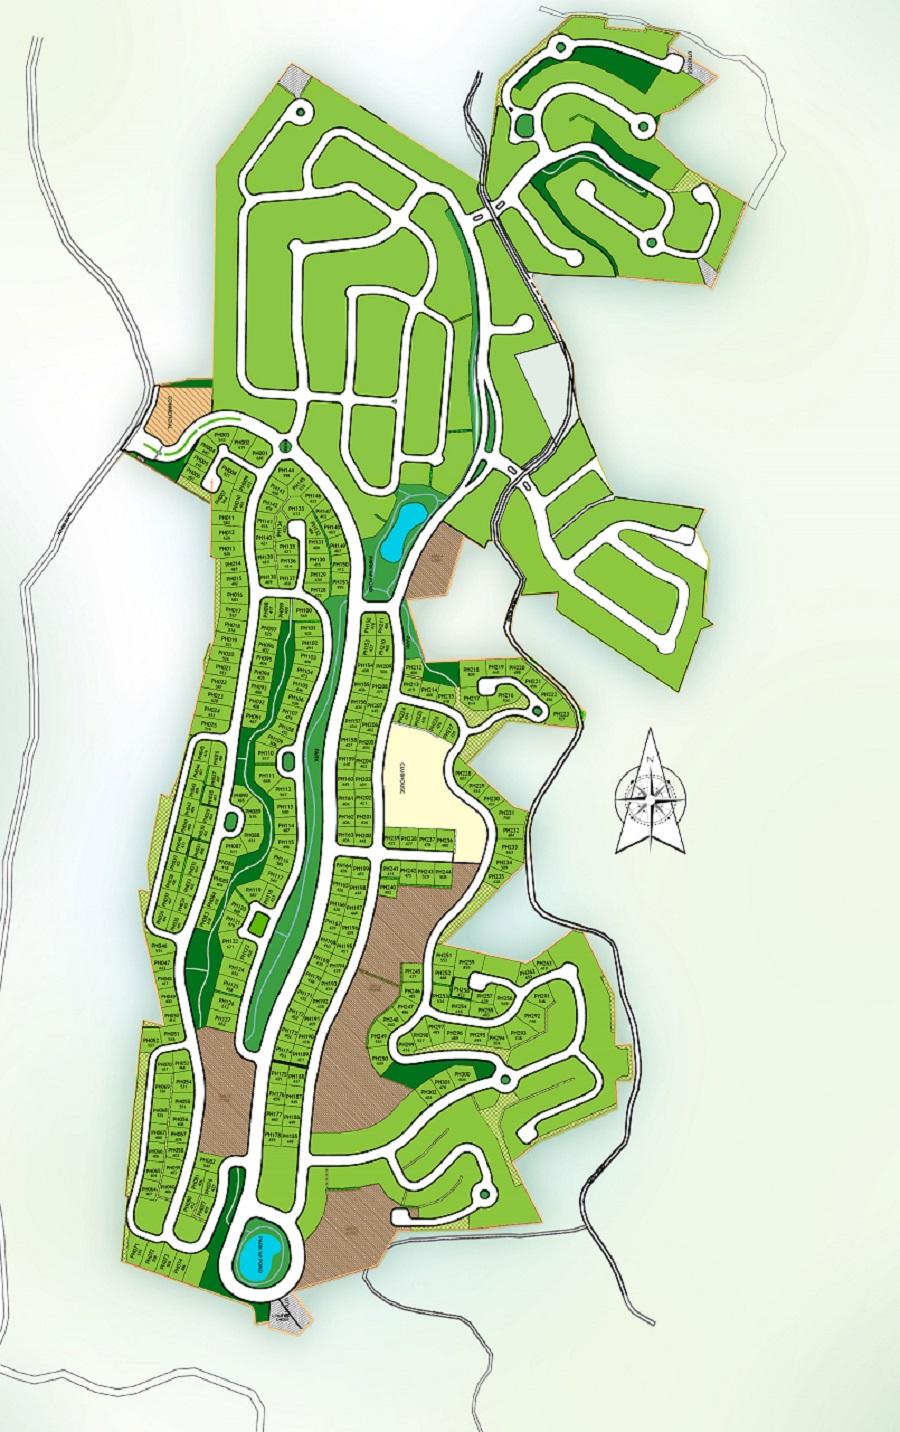 Priveya Hills - Site Development Plan